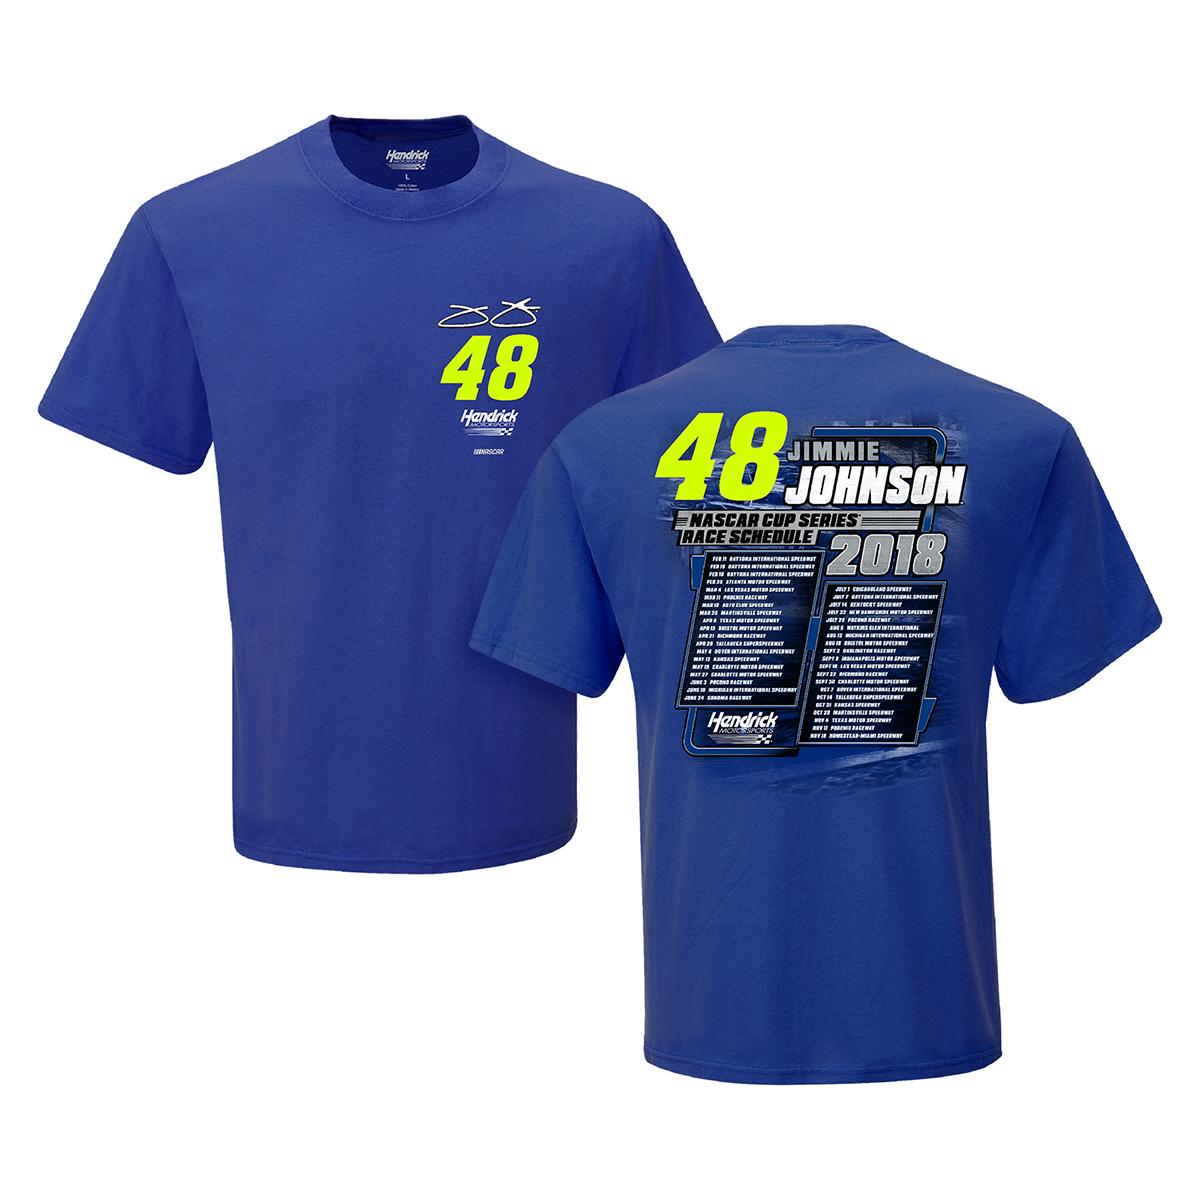 Jimmie Johnson #48 2018 NASCAR Schedule T-shirt